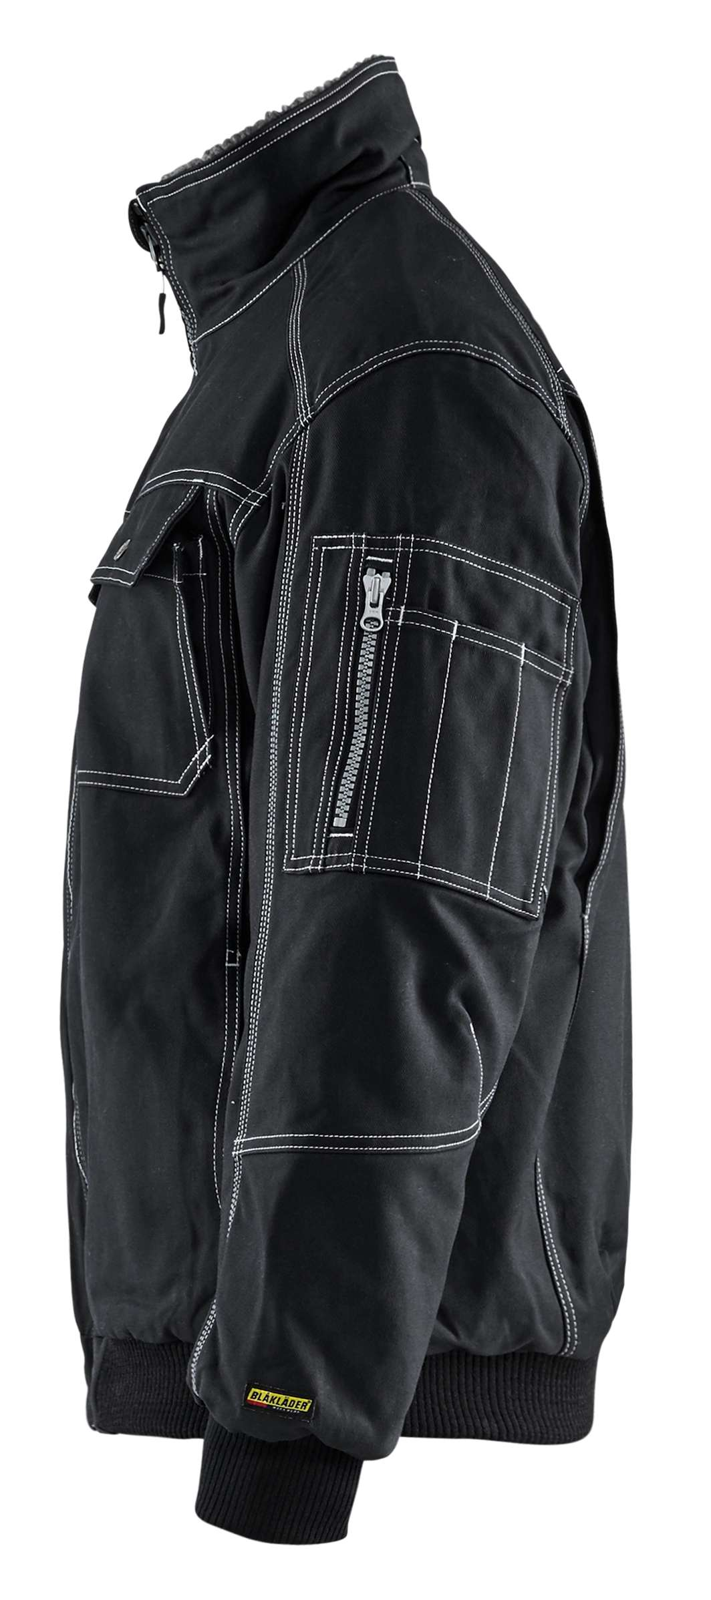 Blaklader Pilot jacks 49161370 zwart(9900)